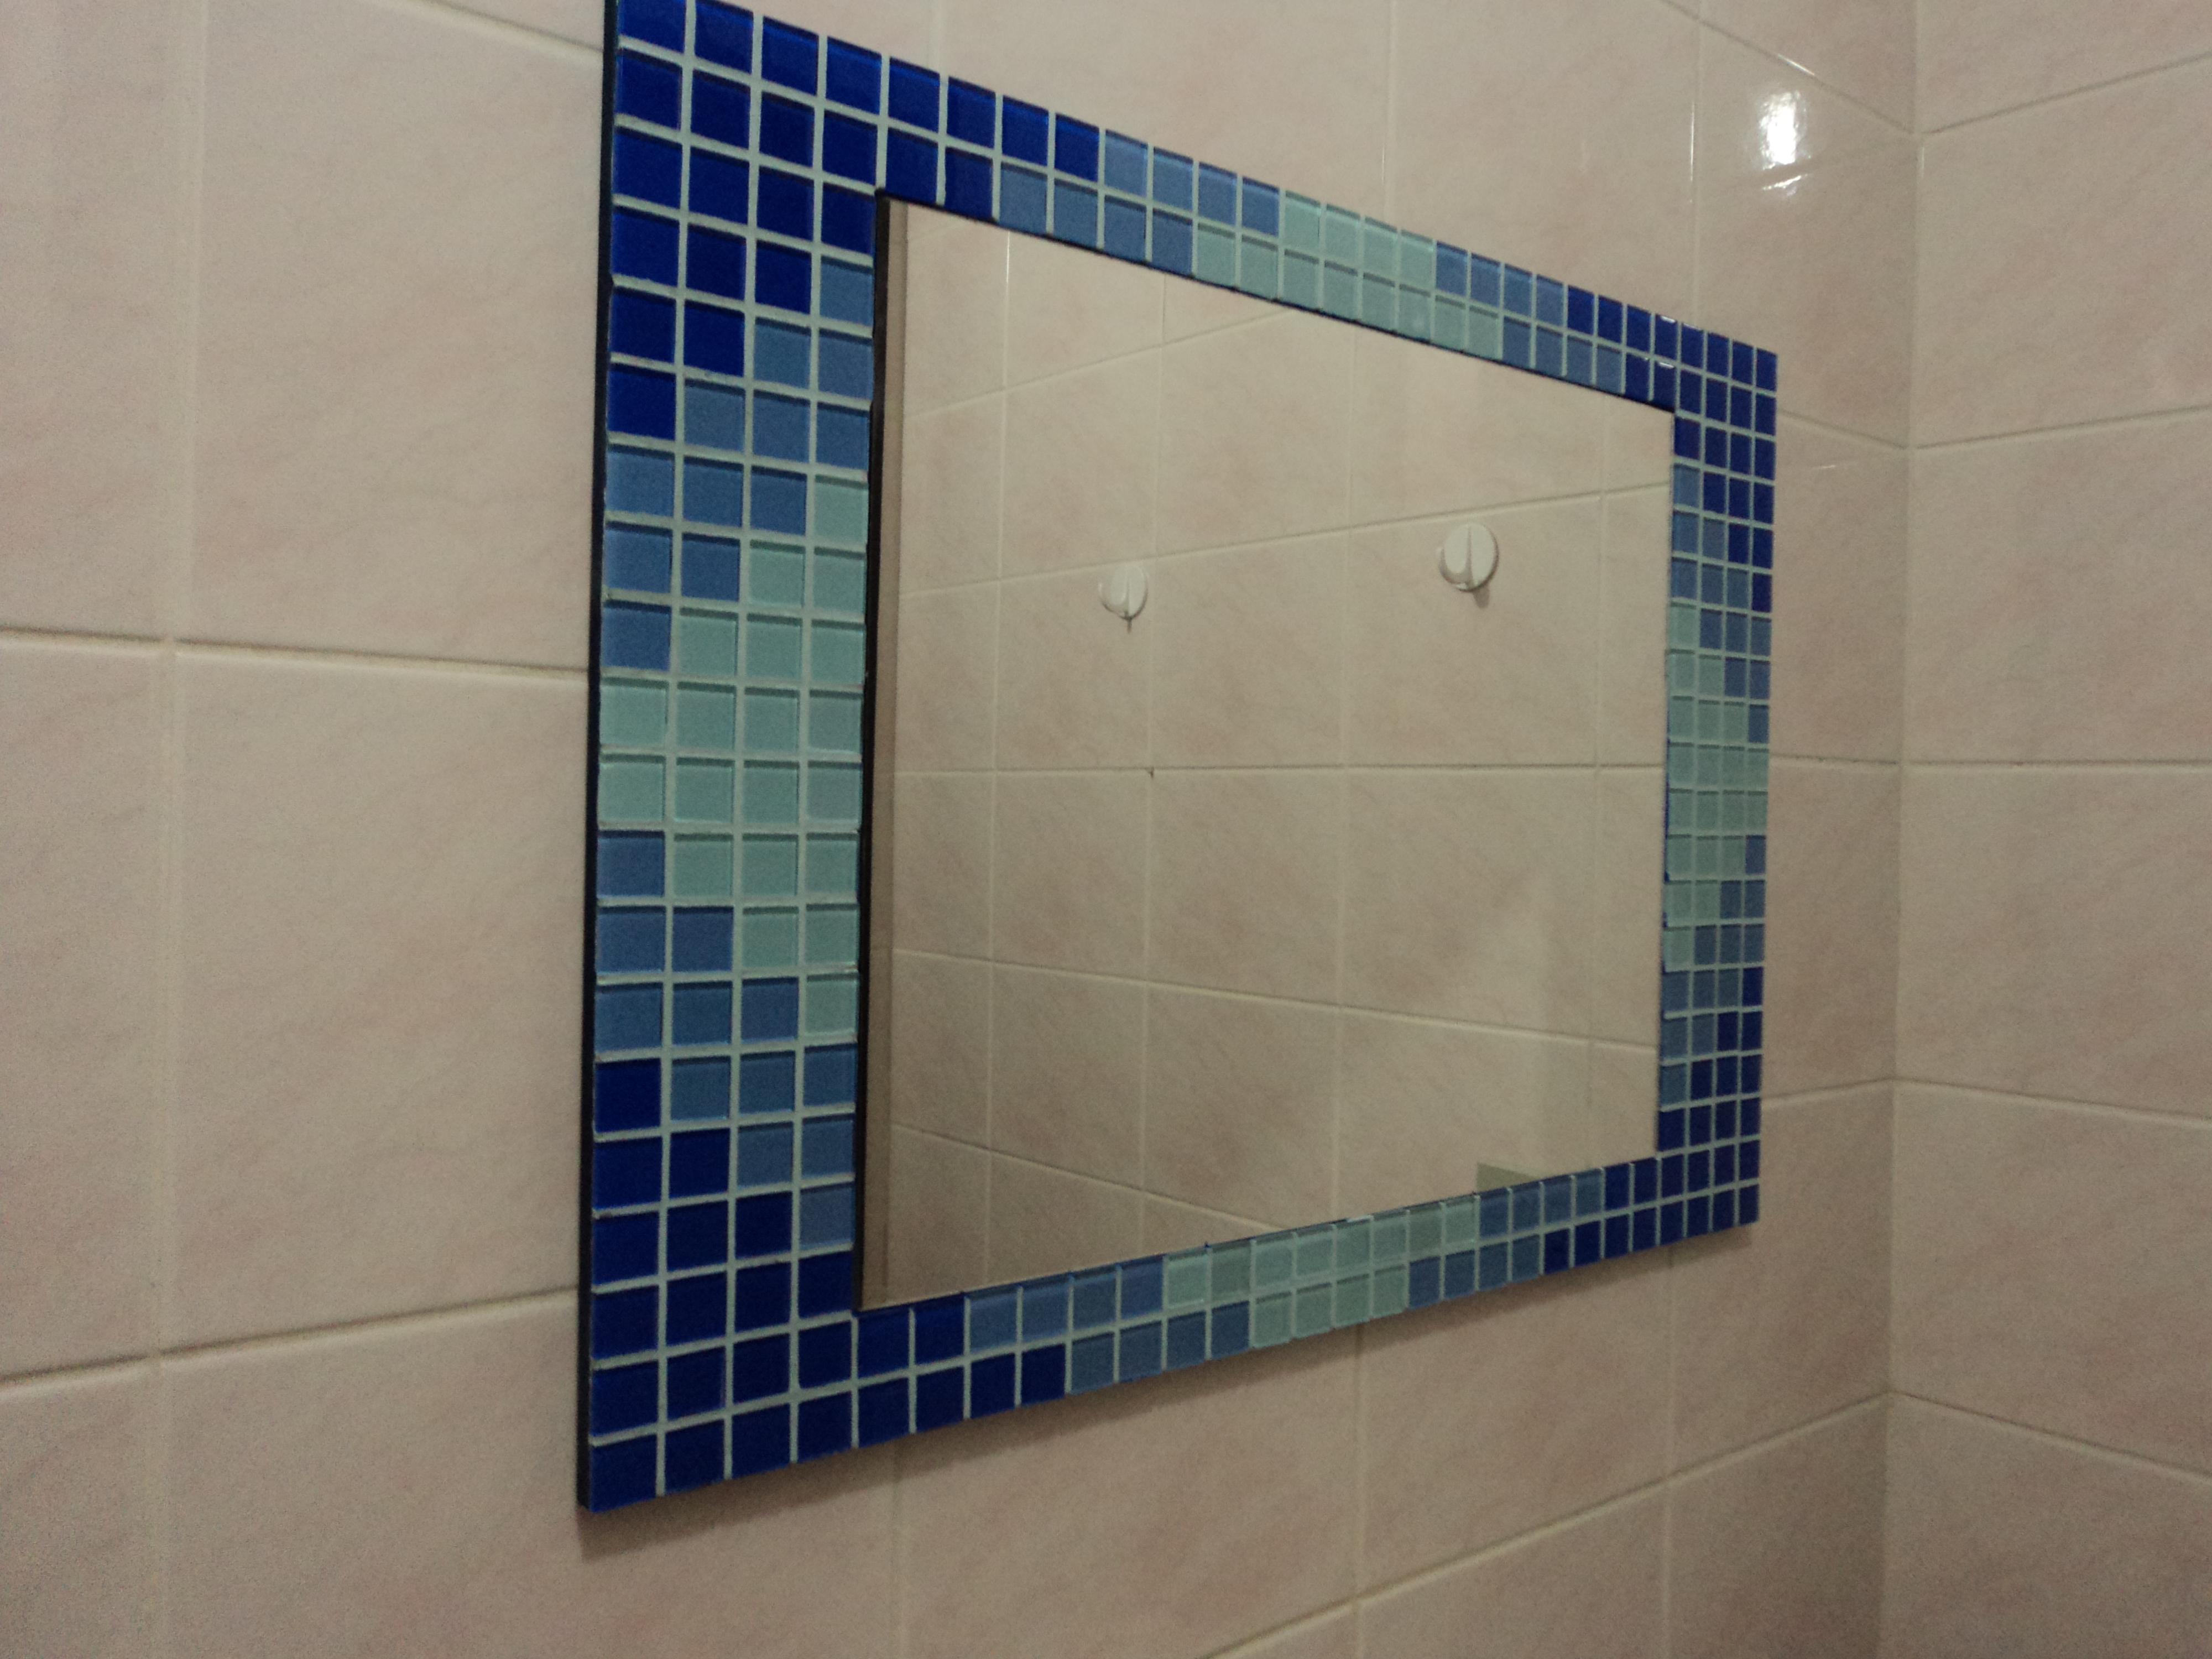 espelho gelatti azul pastilha de vidro espelho gelatti azul mosaico  #283F61 4000x3000 Banheiro Com Pastilhas De Vidro Azul